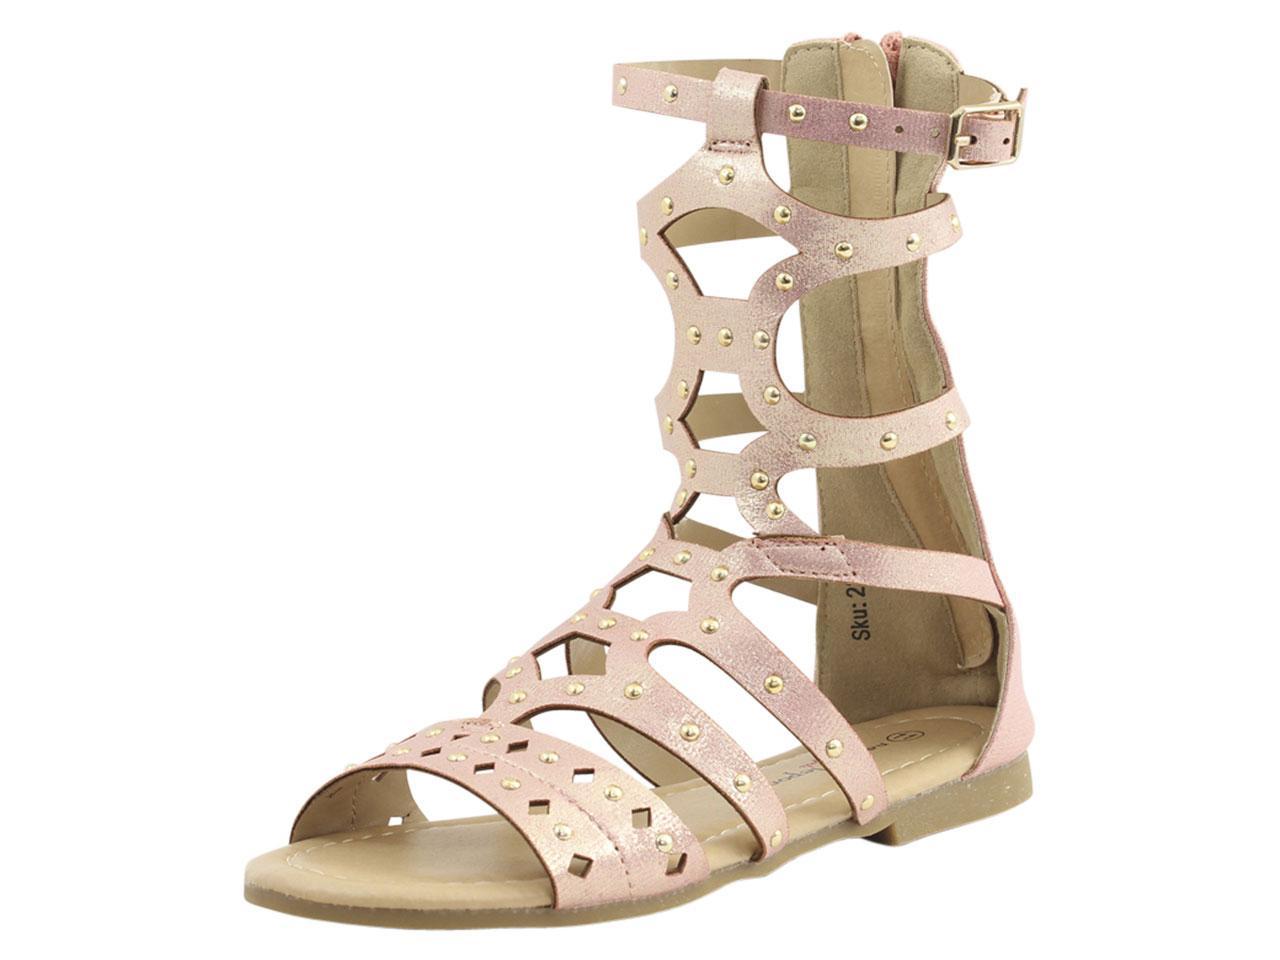 Image of Nanette Lepore Little/Big Girl's Studded Gladiator Sandals Shoes - Pink Metallic - 12 M US Little Kid